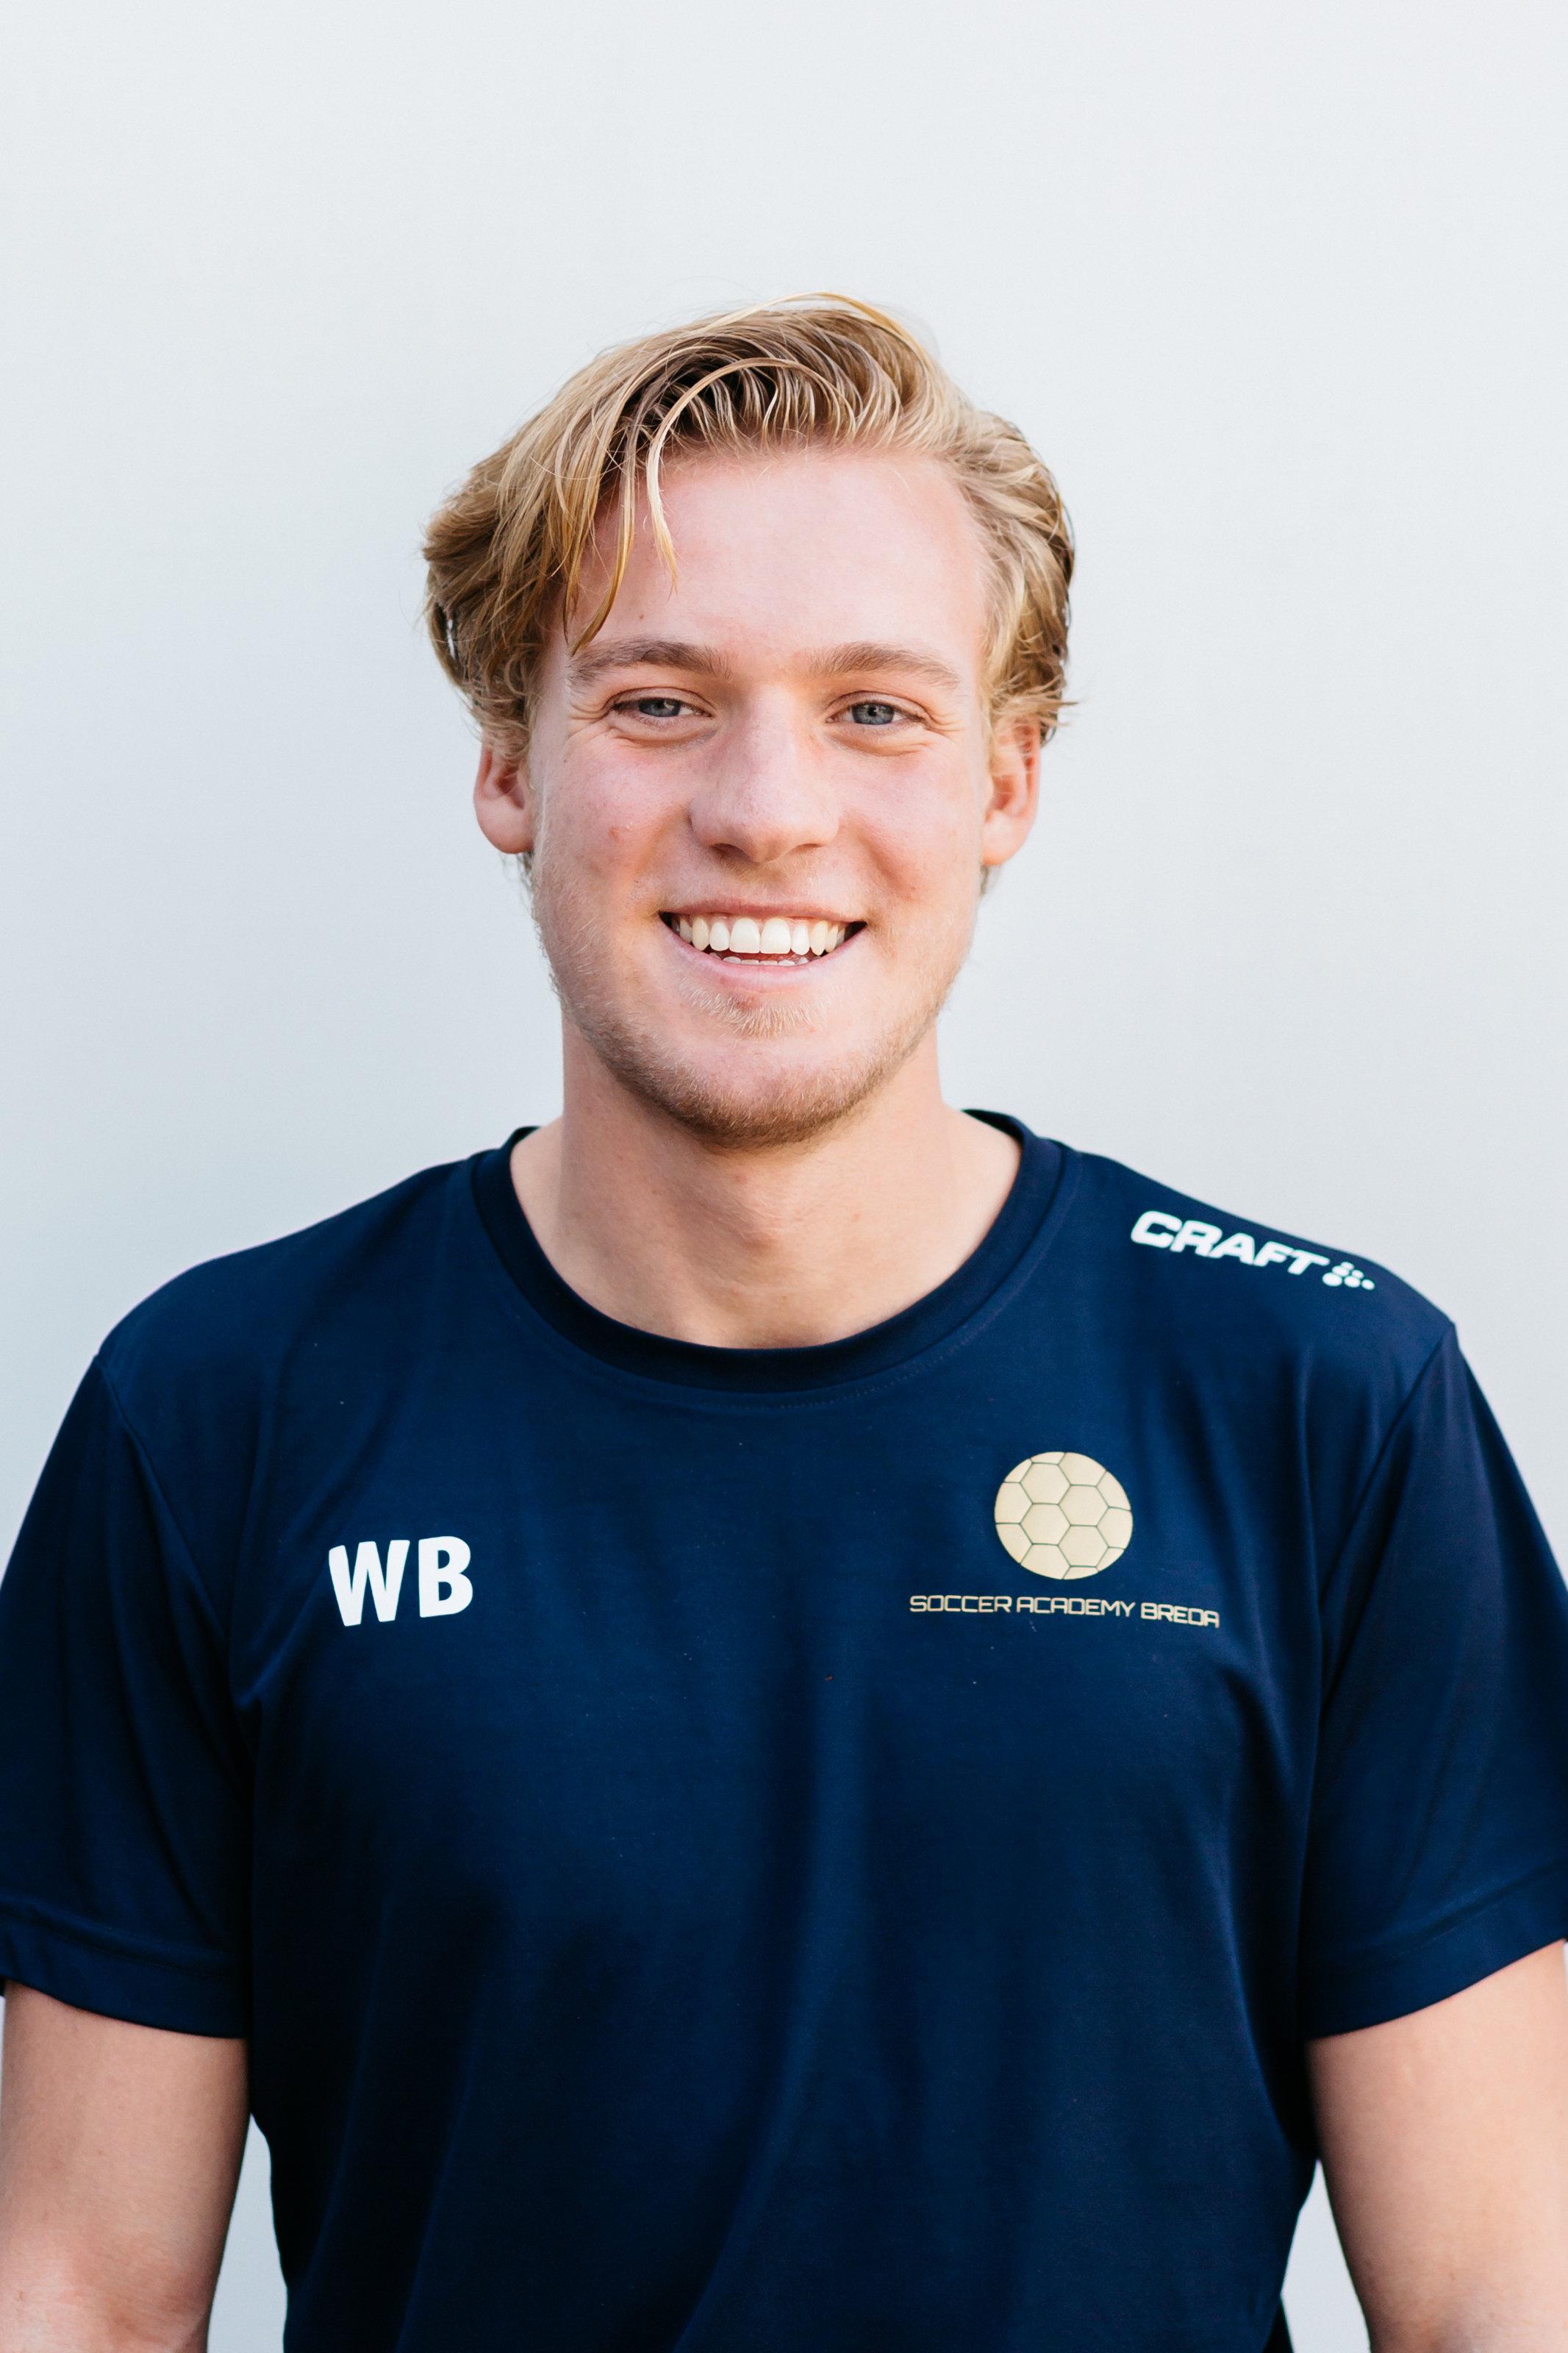 https://socceracademybreda.nl/wp-content/uploads/2020/10/Wout-Brinkman.jpg